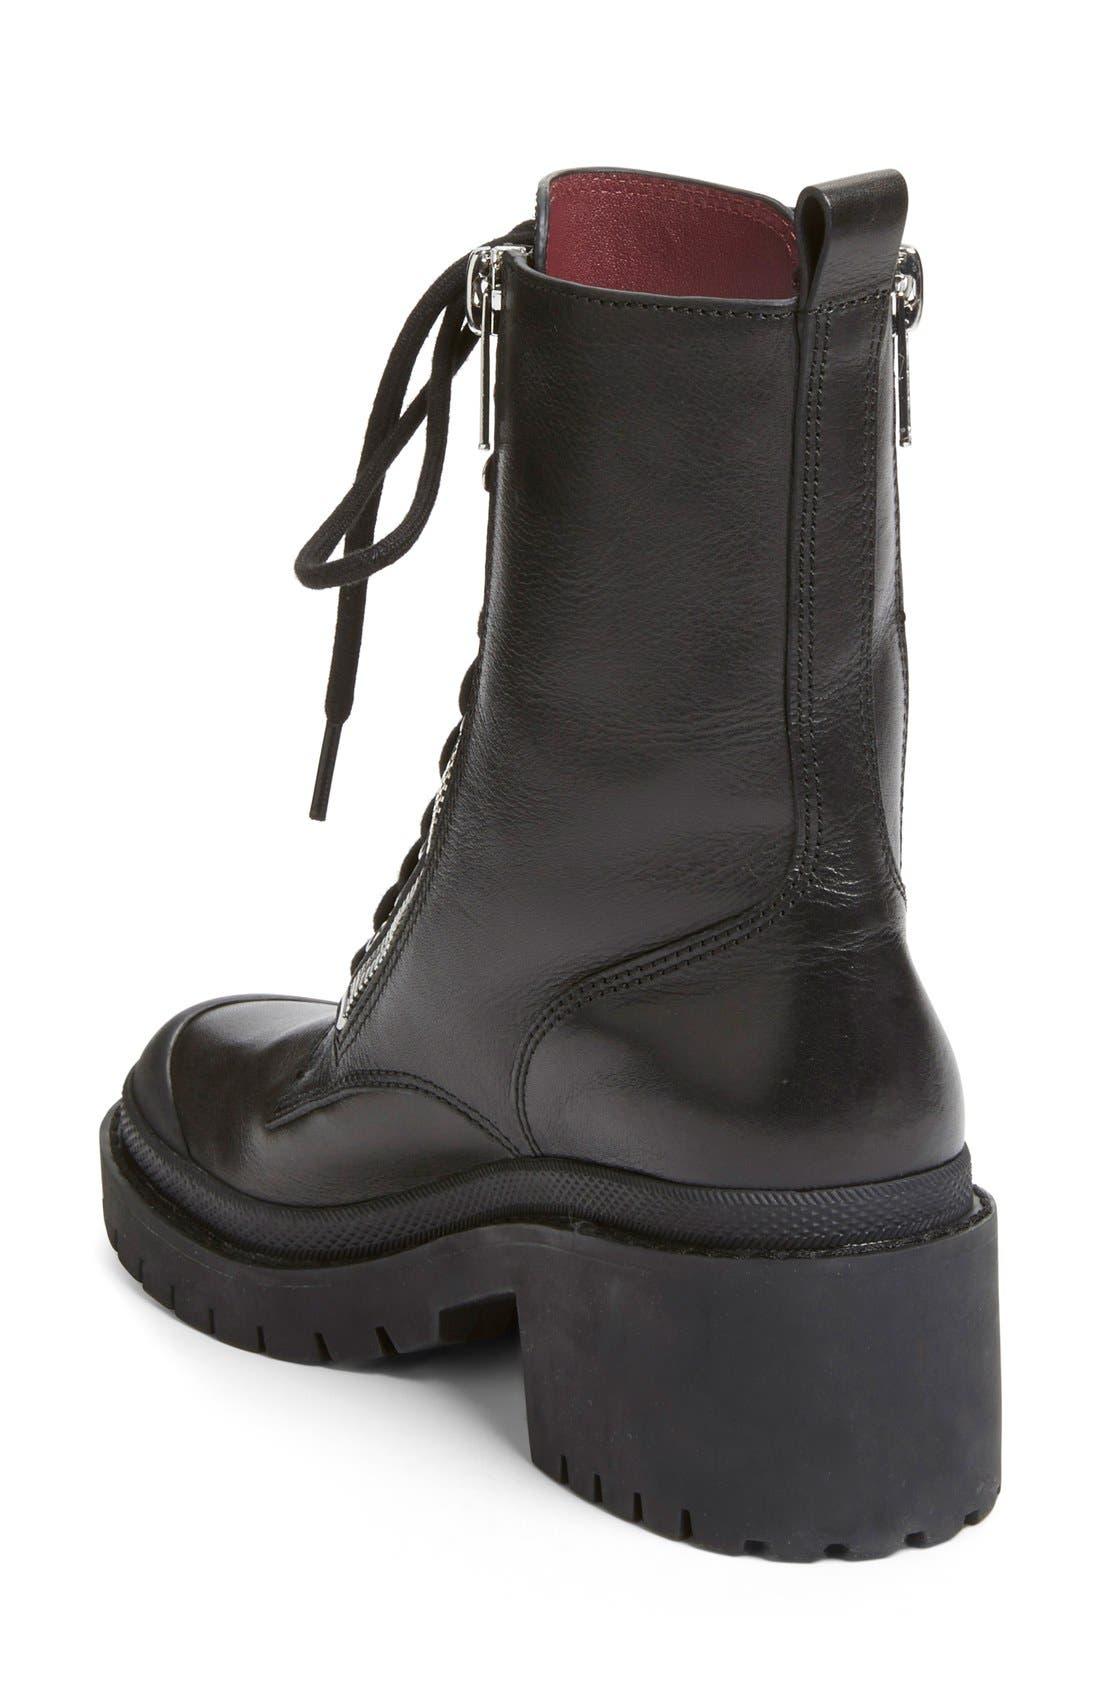 Alternate Image 2  - MARC BY MARC JACOBS 'Zip It' Multi Zip Boot (Women)